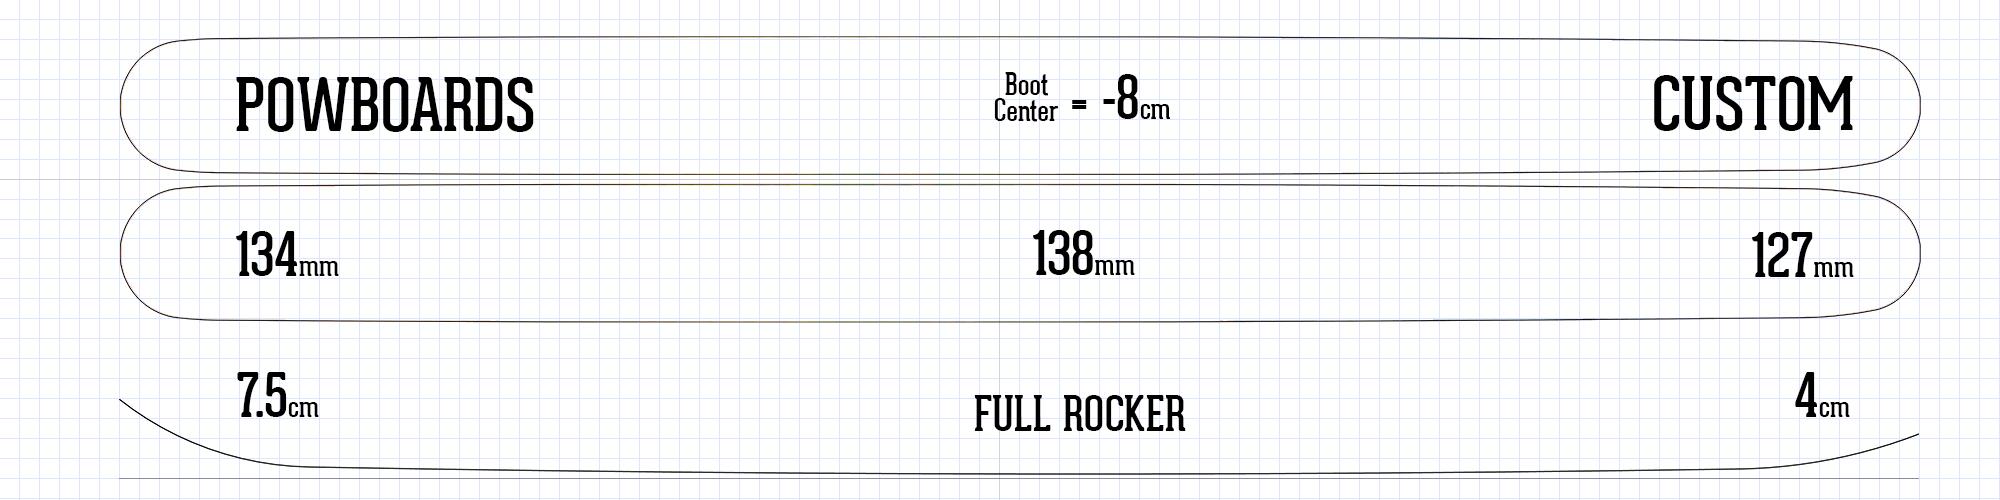 Powderboards ski information rocker camber profile